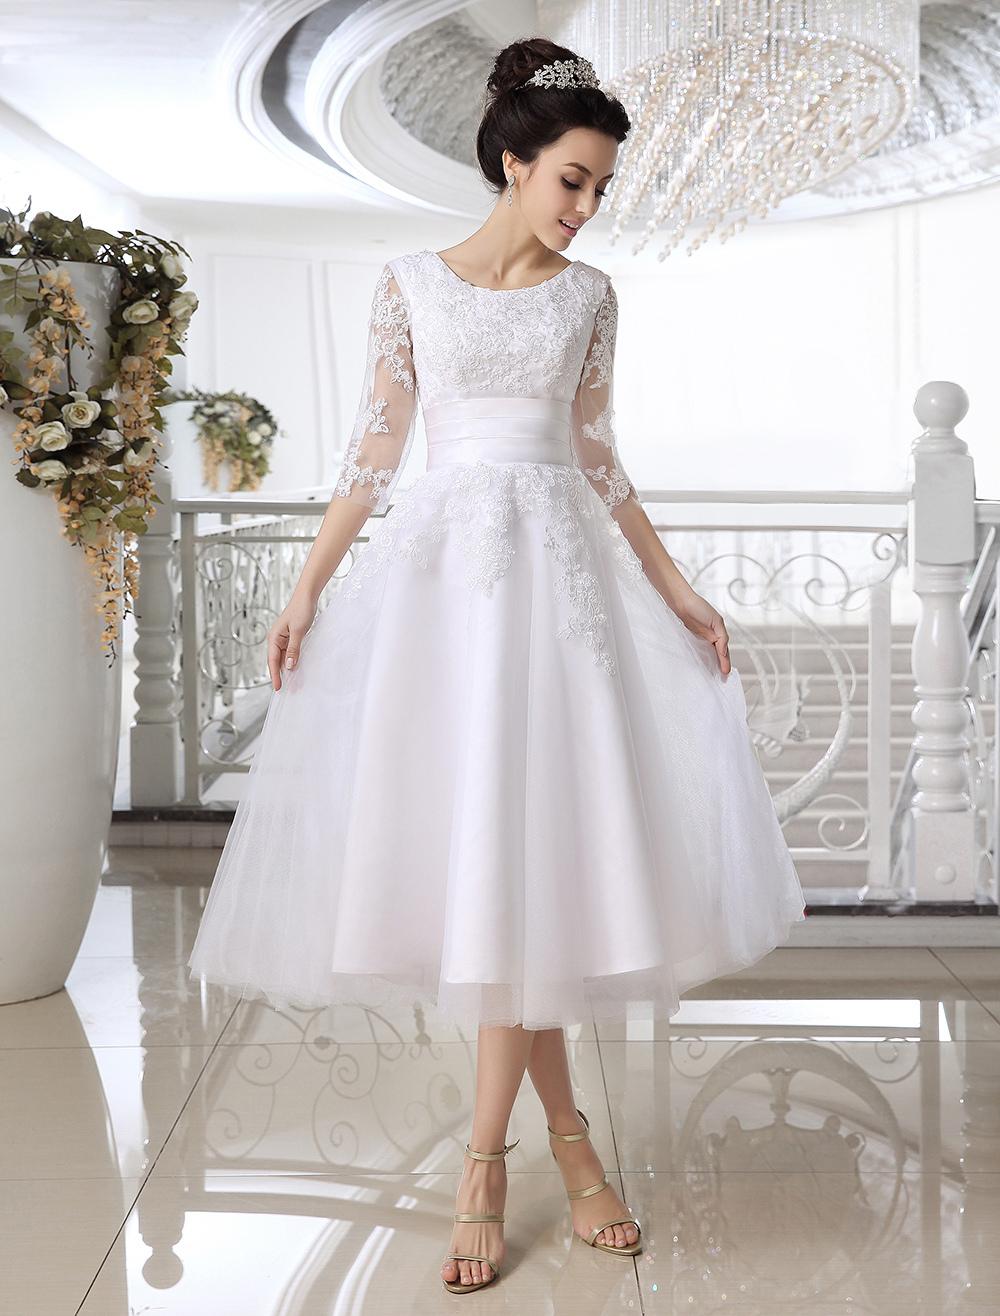 White Applique Net Bridal Wedding Dress